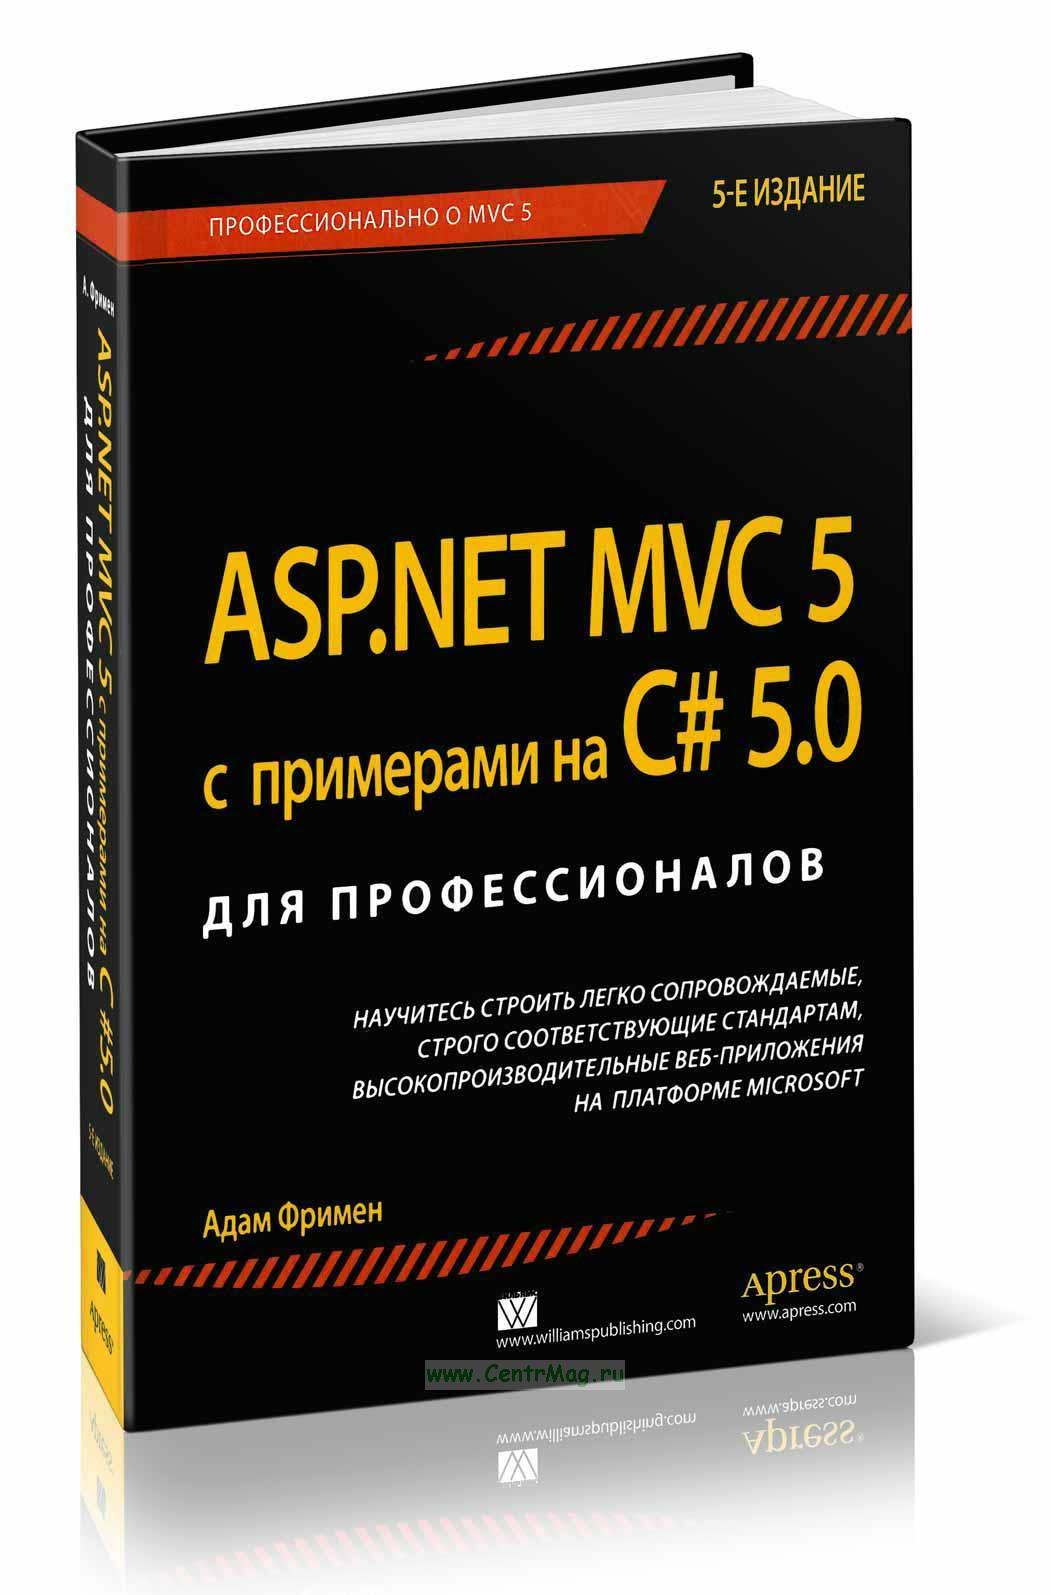 ASP.NET MVC 5 с примерами на C# для профессионалов (5-е издание)